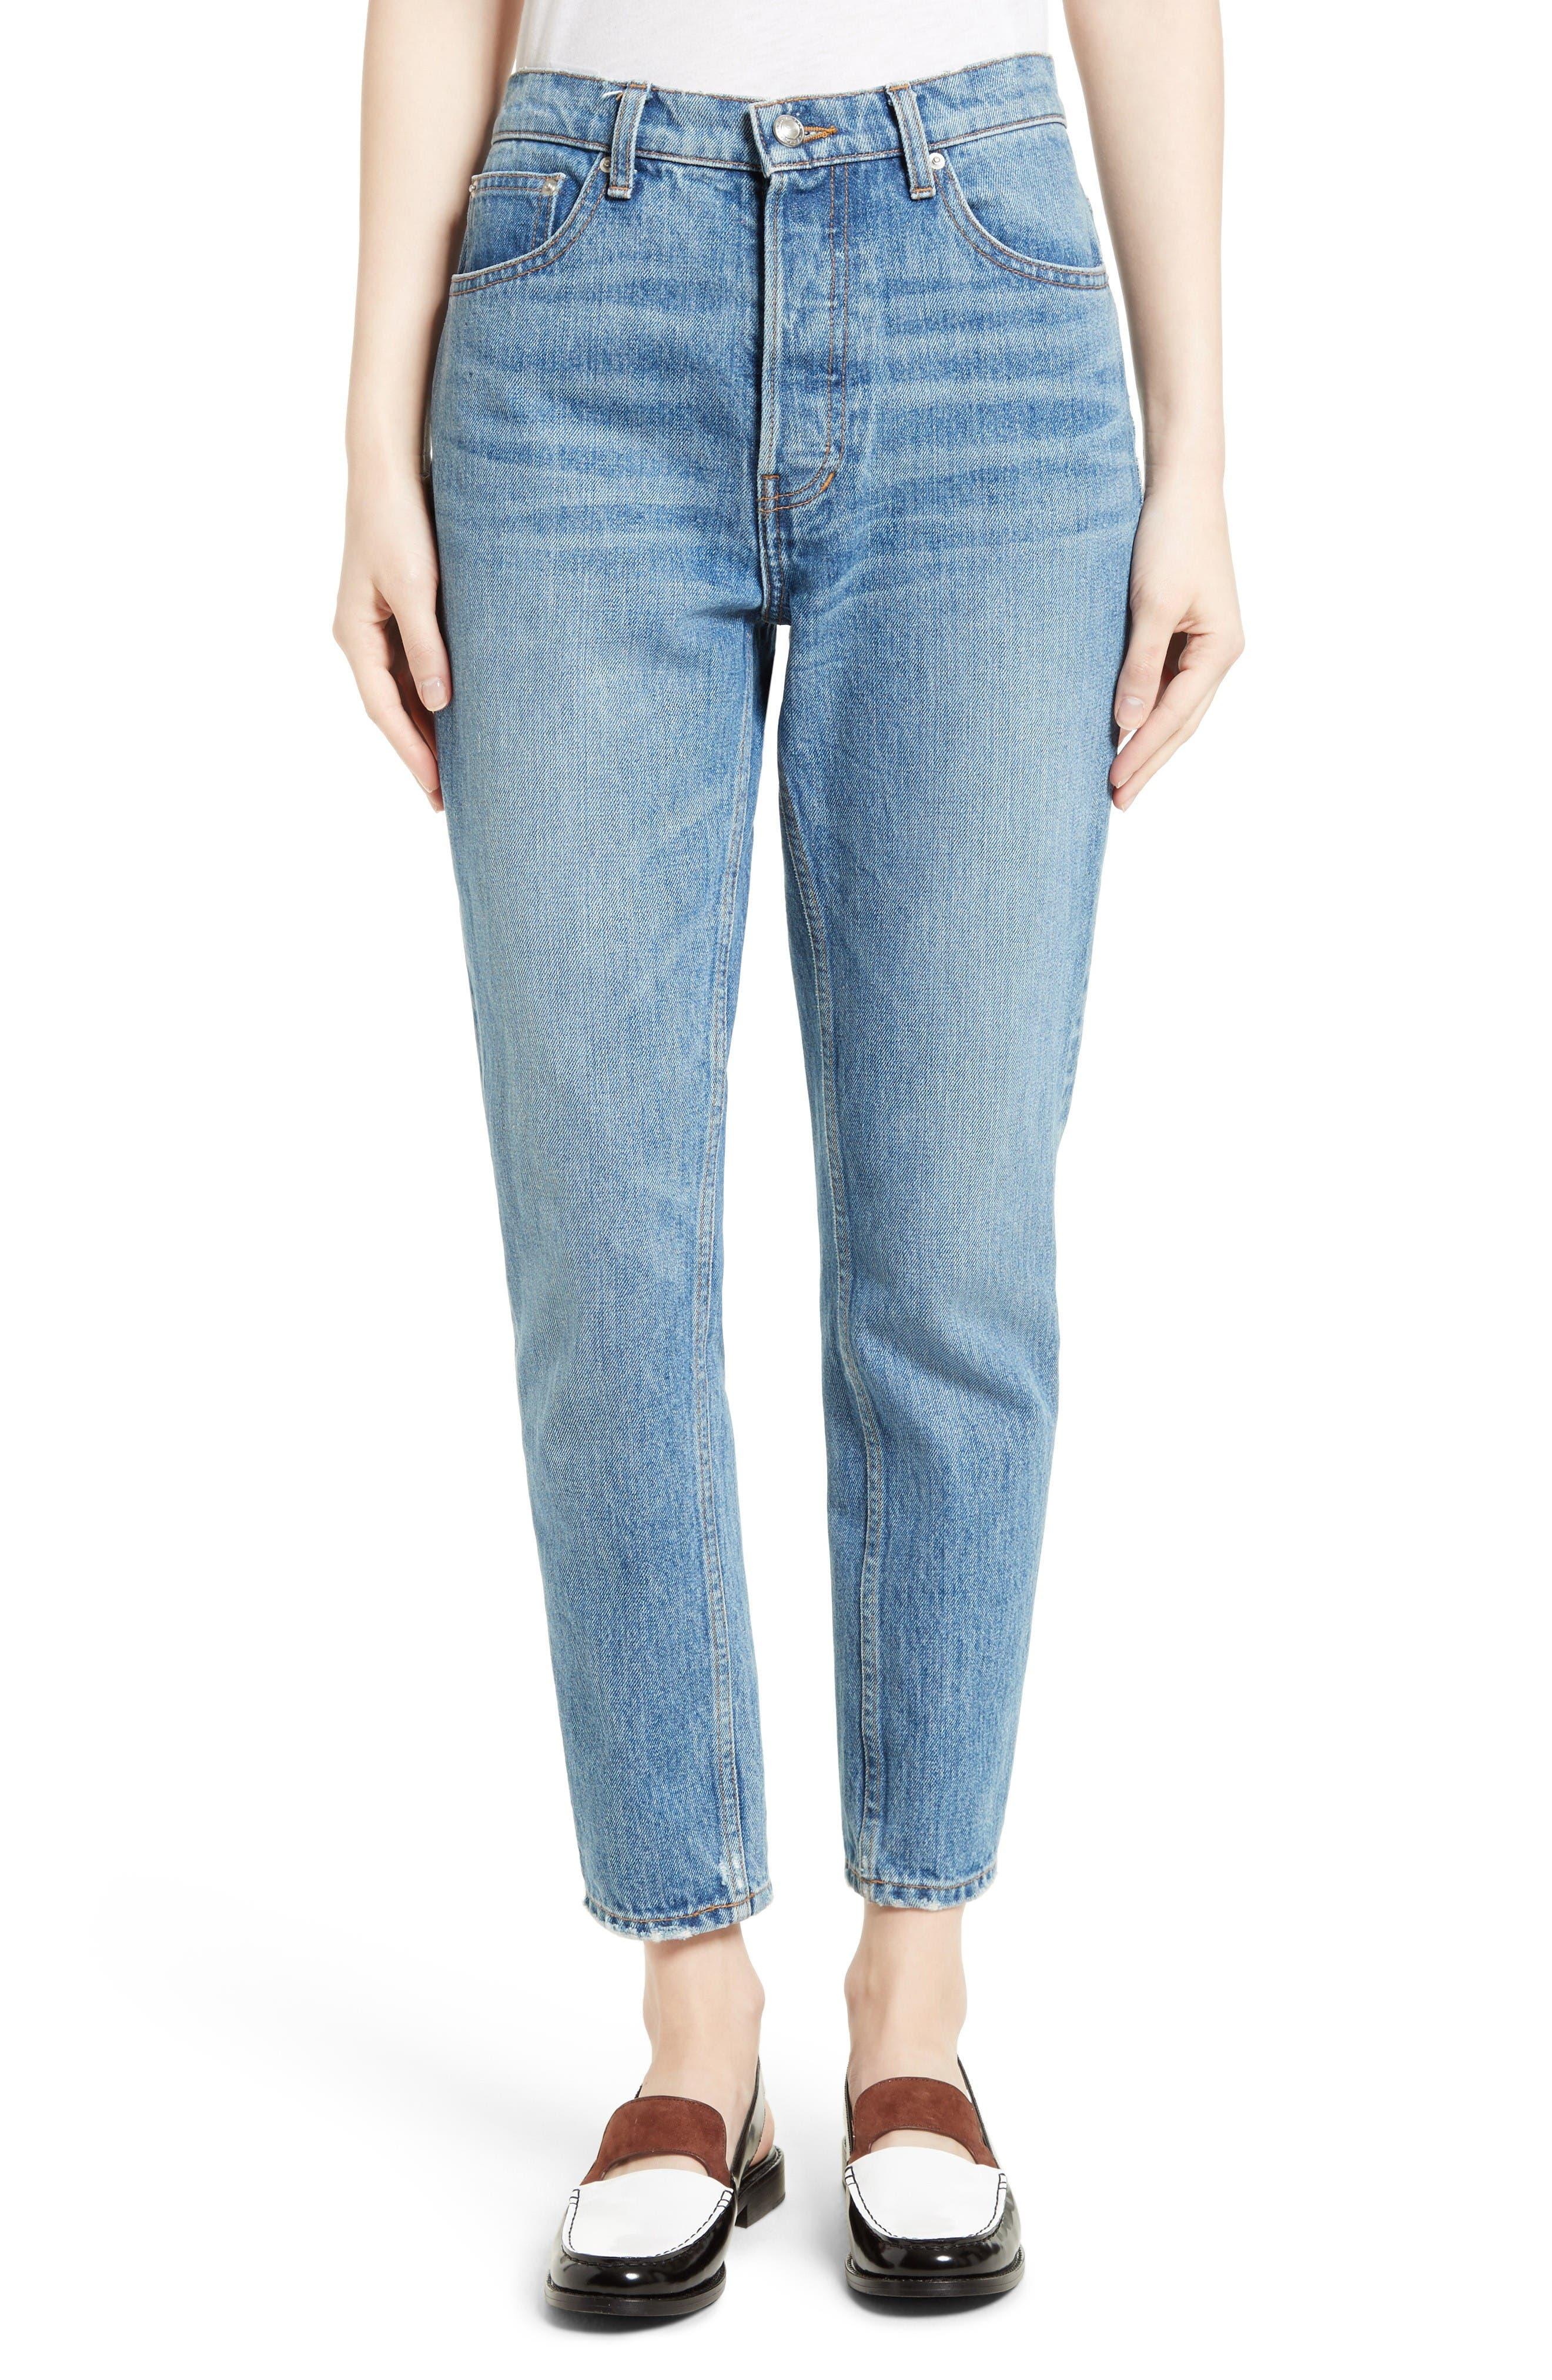 Derek Lam 10 Crosby Lou High Waist Jeans